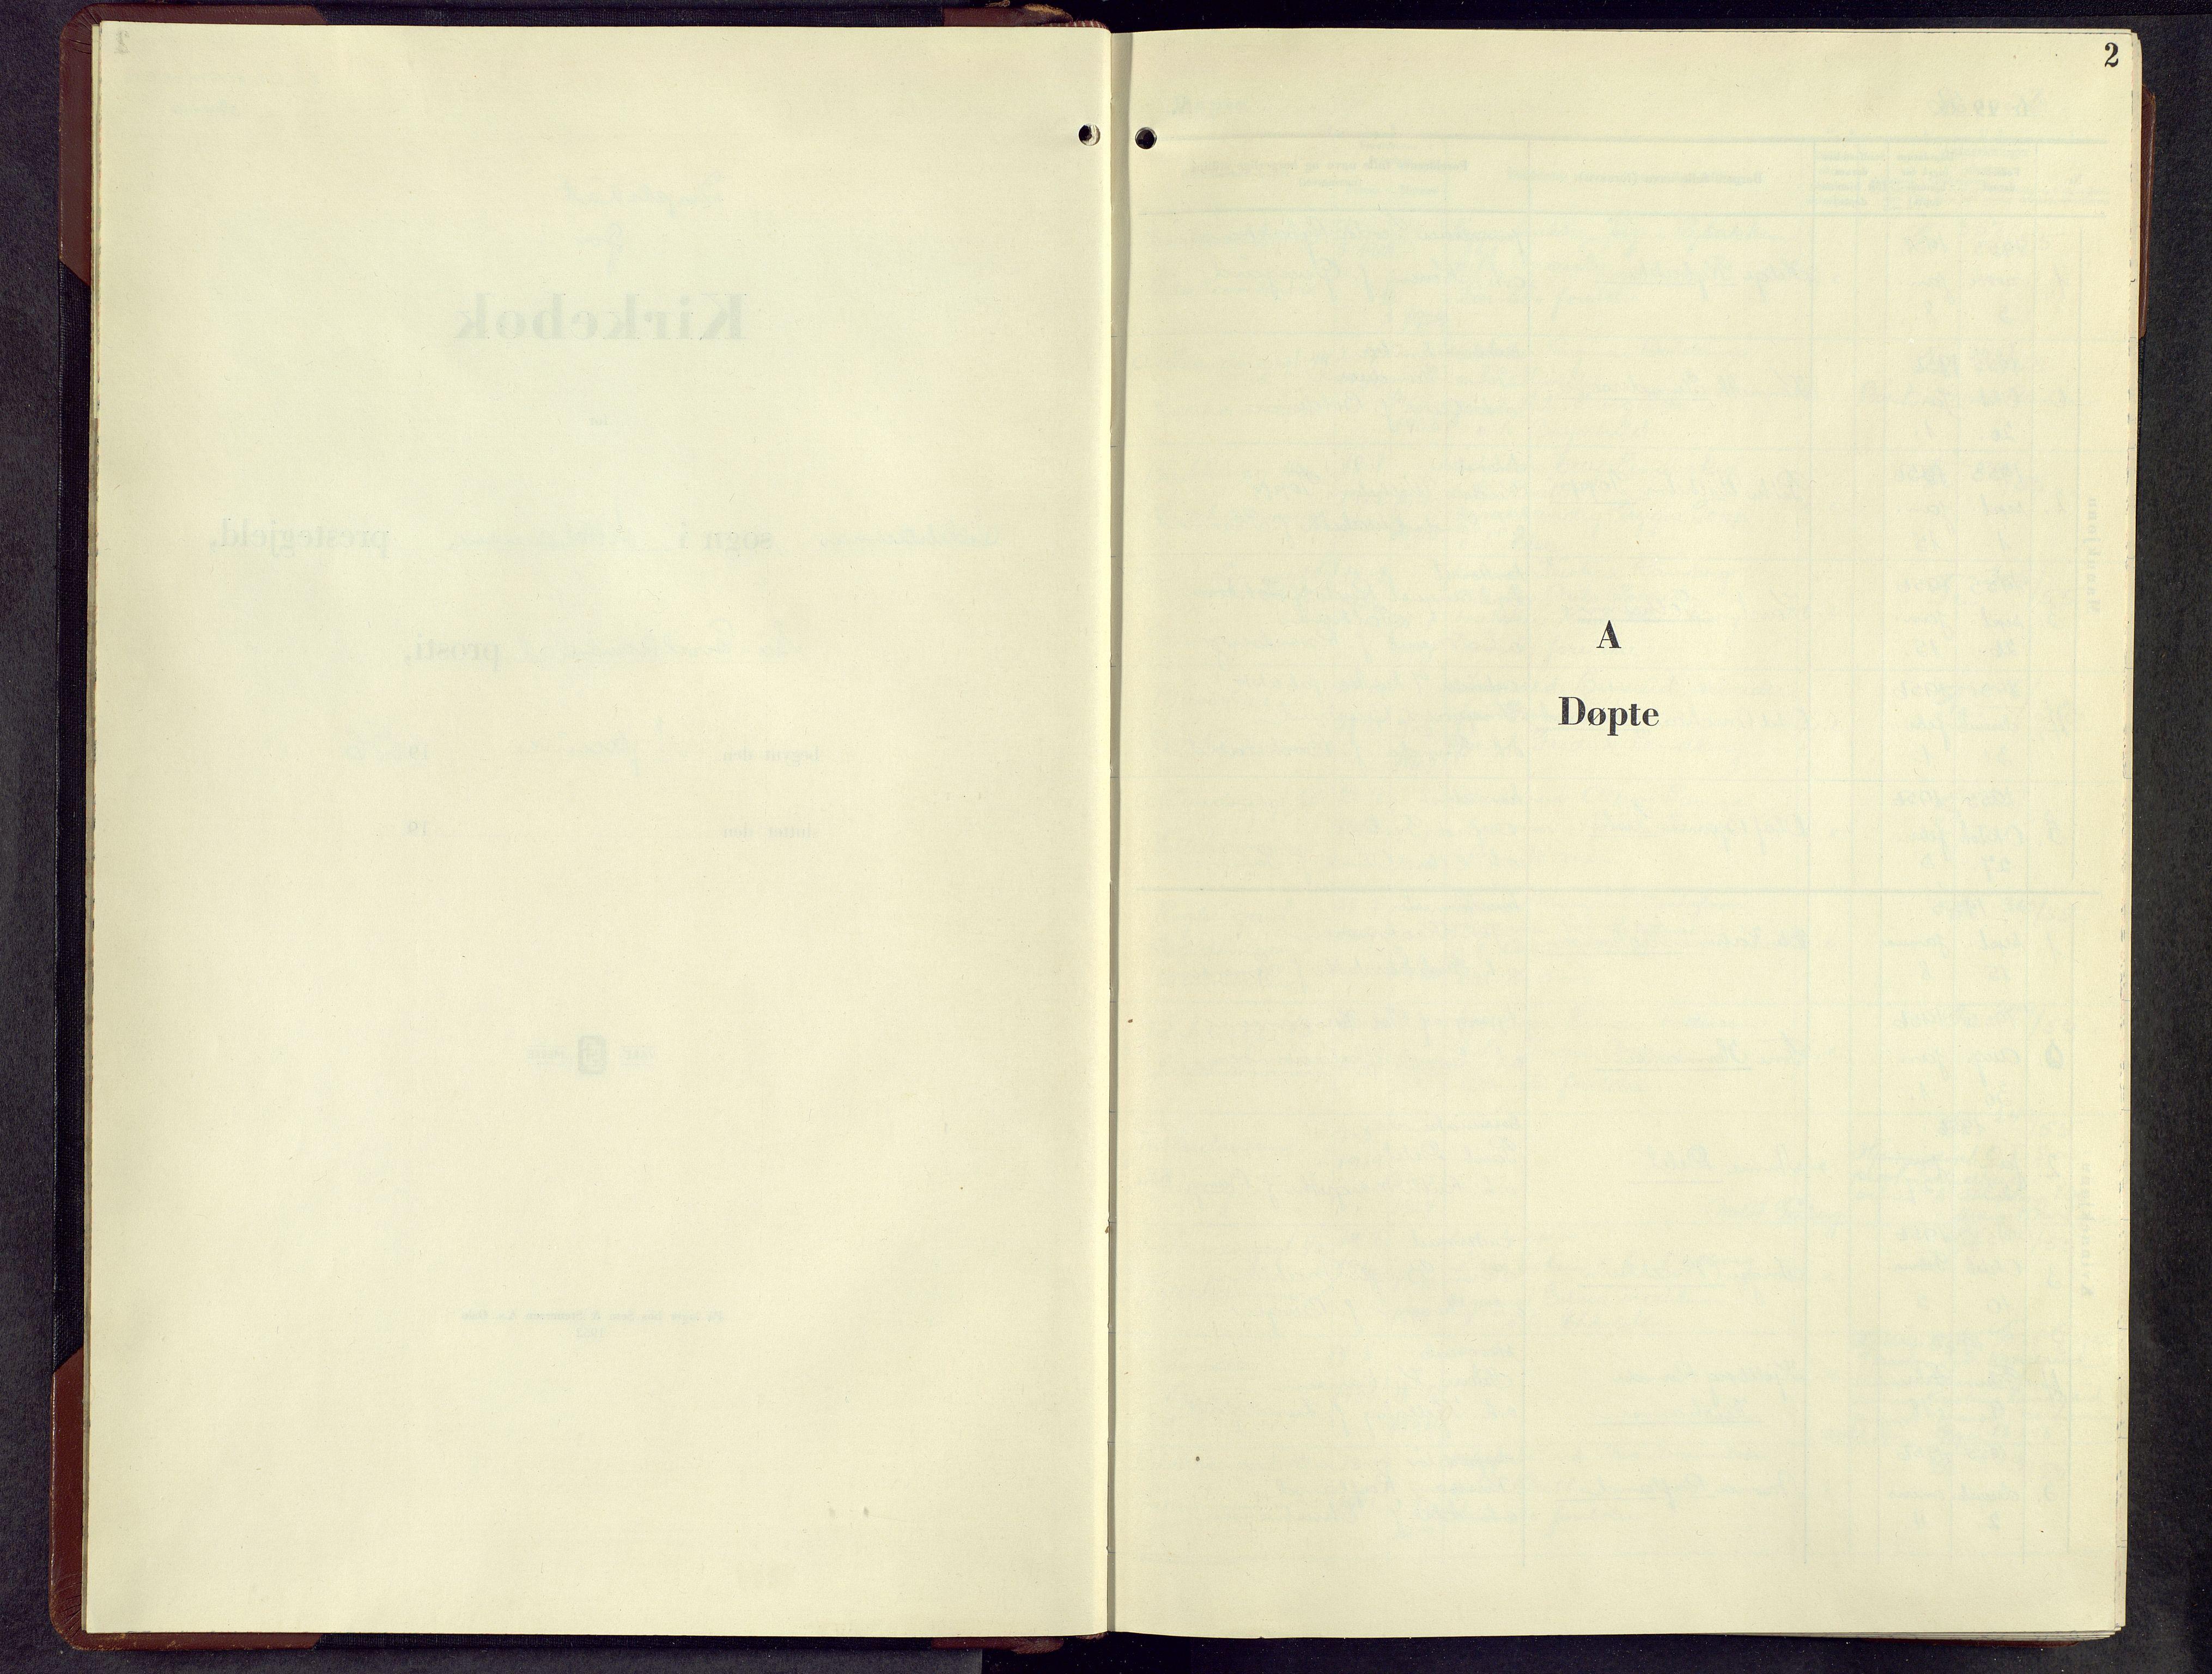 SAH, Lillehammer prestekontor, H/Ha/Hab/L0006: Parish register (copy) no. 6, 1956-1958, p. 2